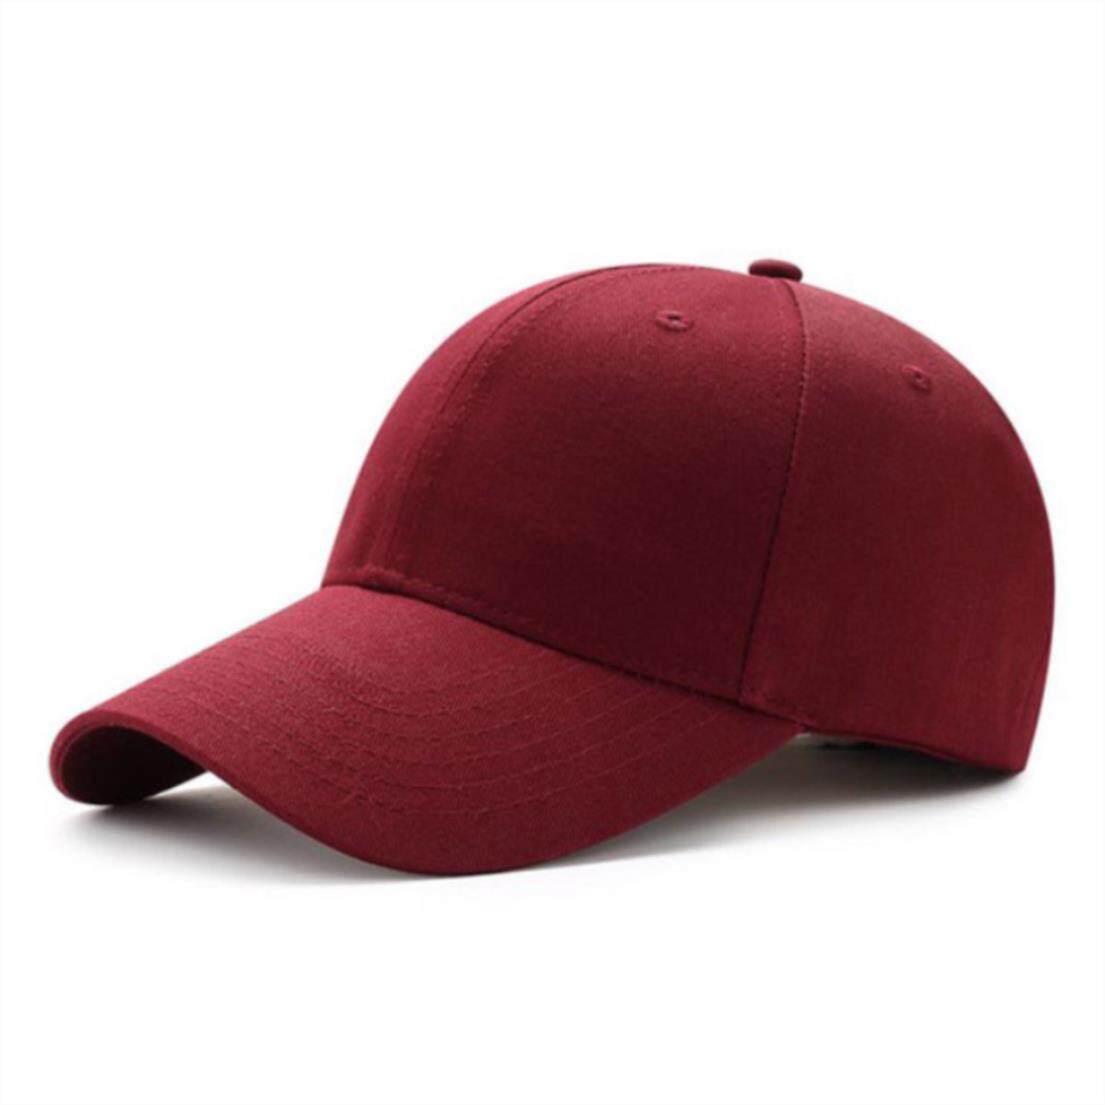 Men Women Plain Curved Sun Visor Baseball Cap Hat Solid Color Fashion Adjustable Caps By Bochang.